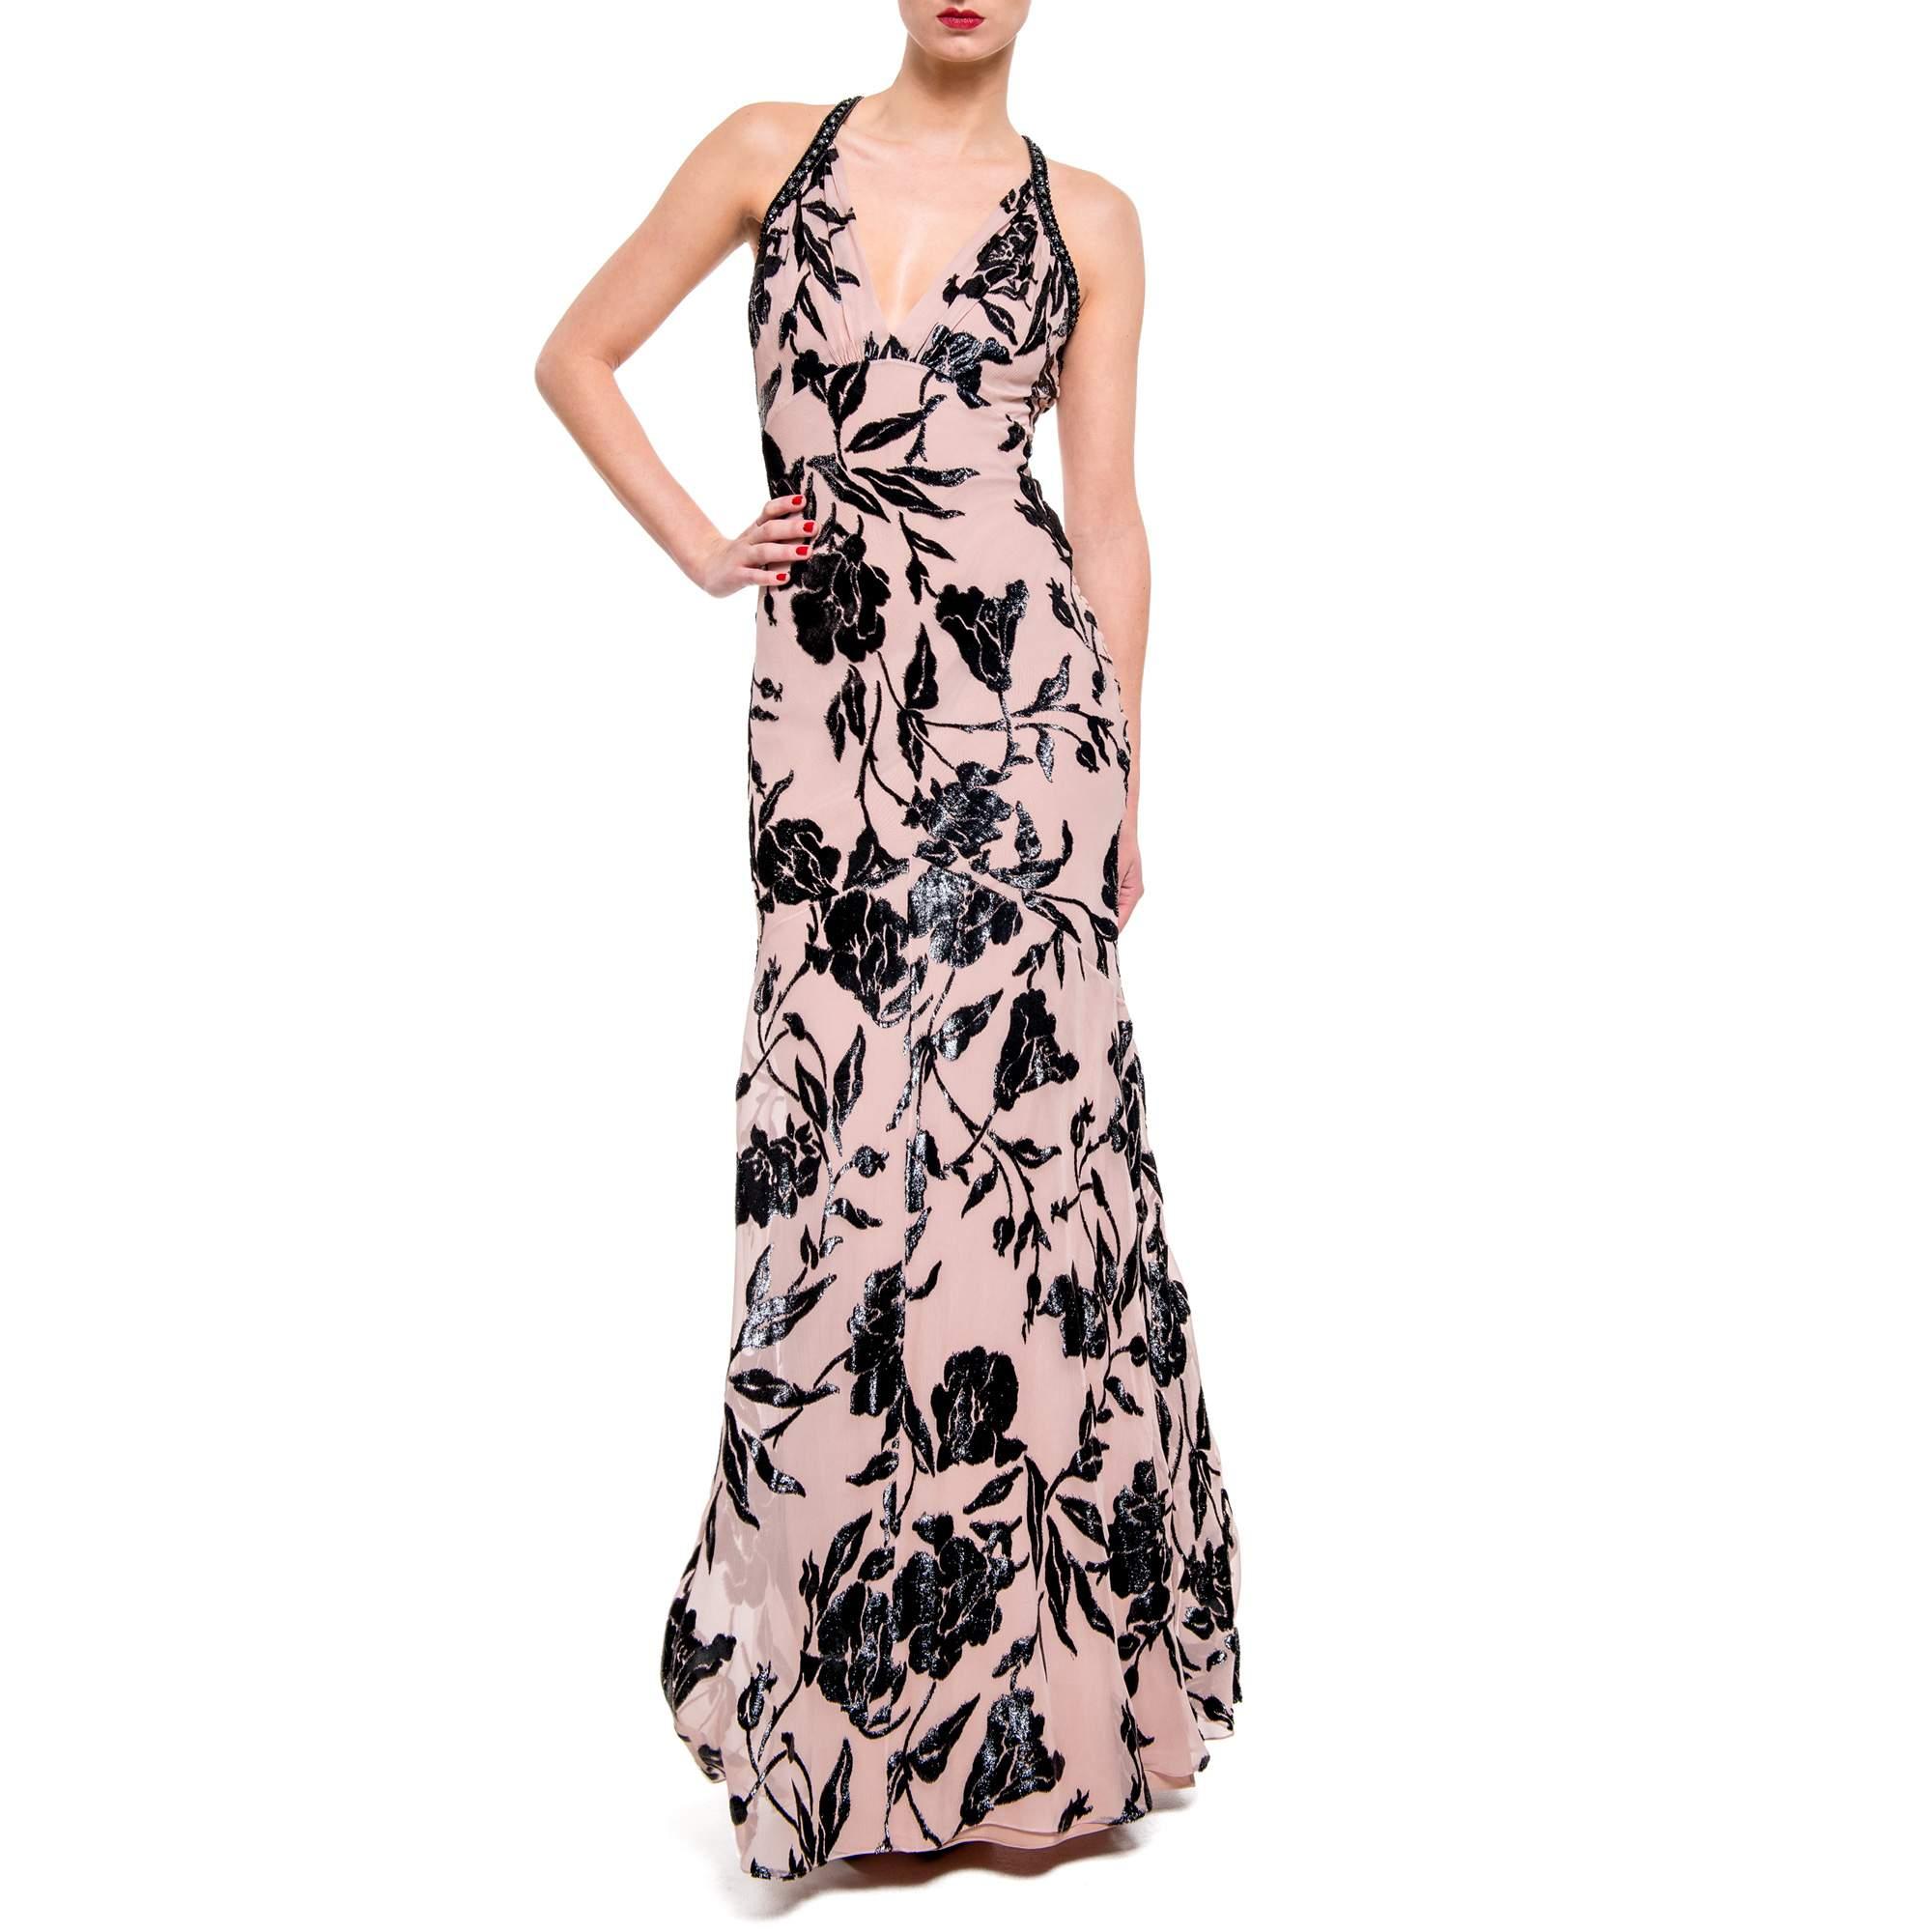 Dior Evening Dress